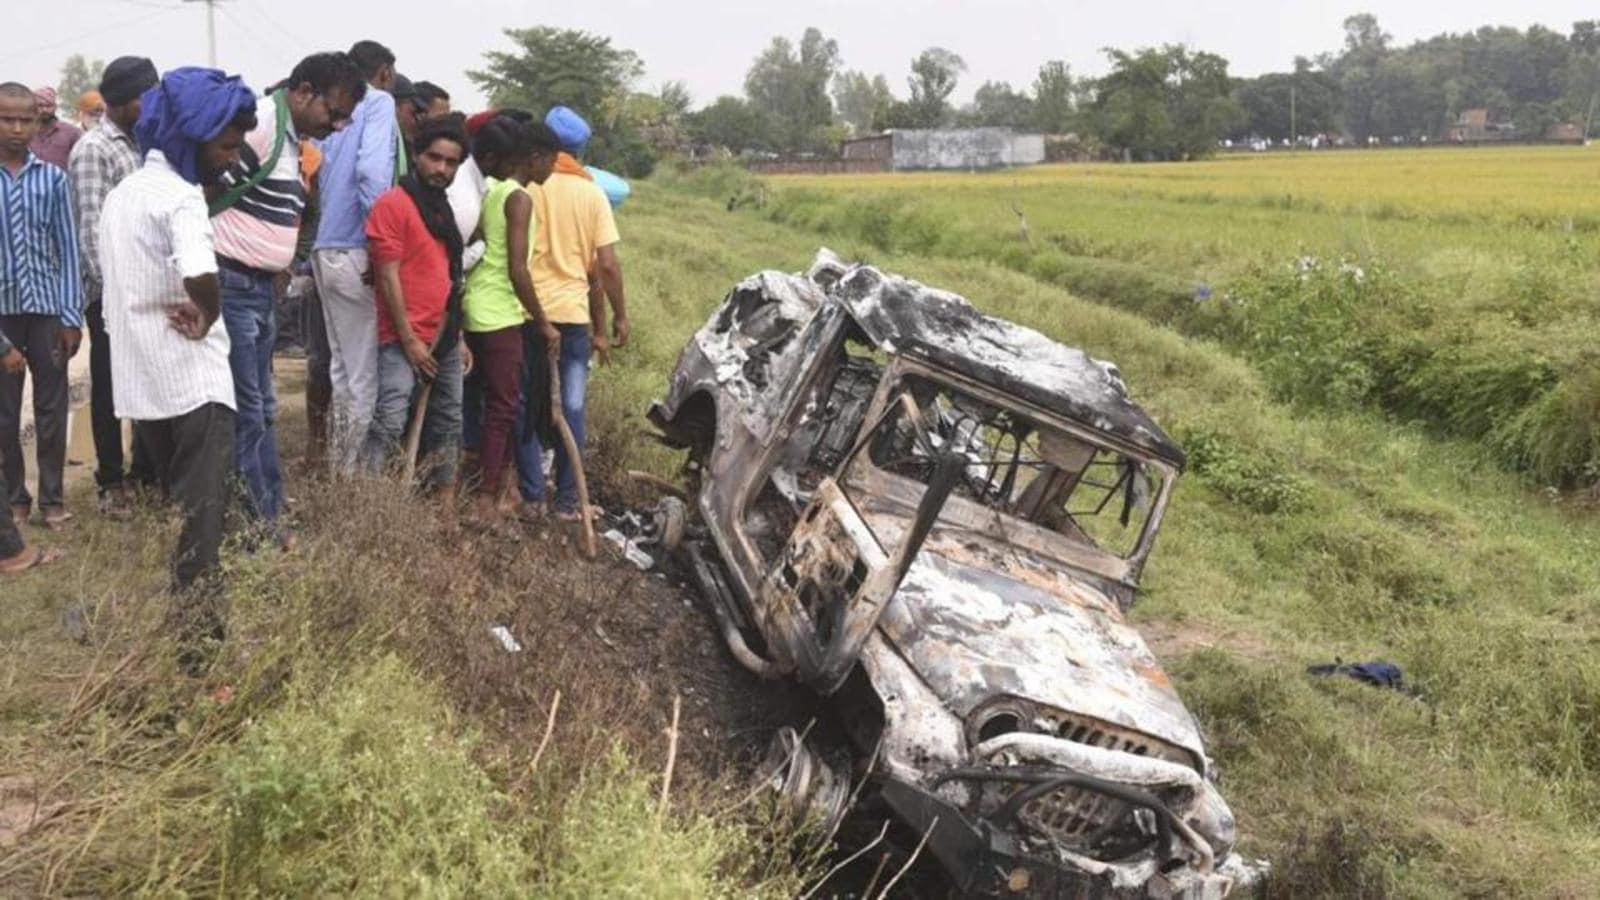 Lakhimpur Kheri: Investigators reviewing 147 videos for clues